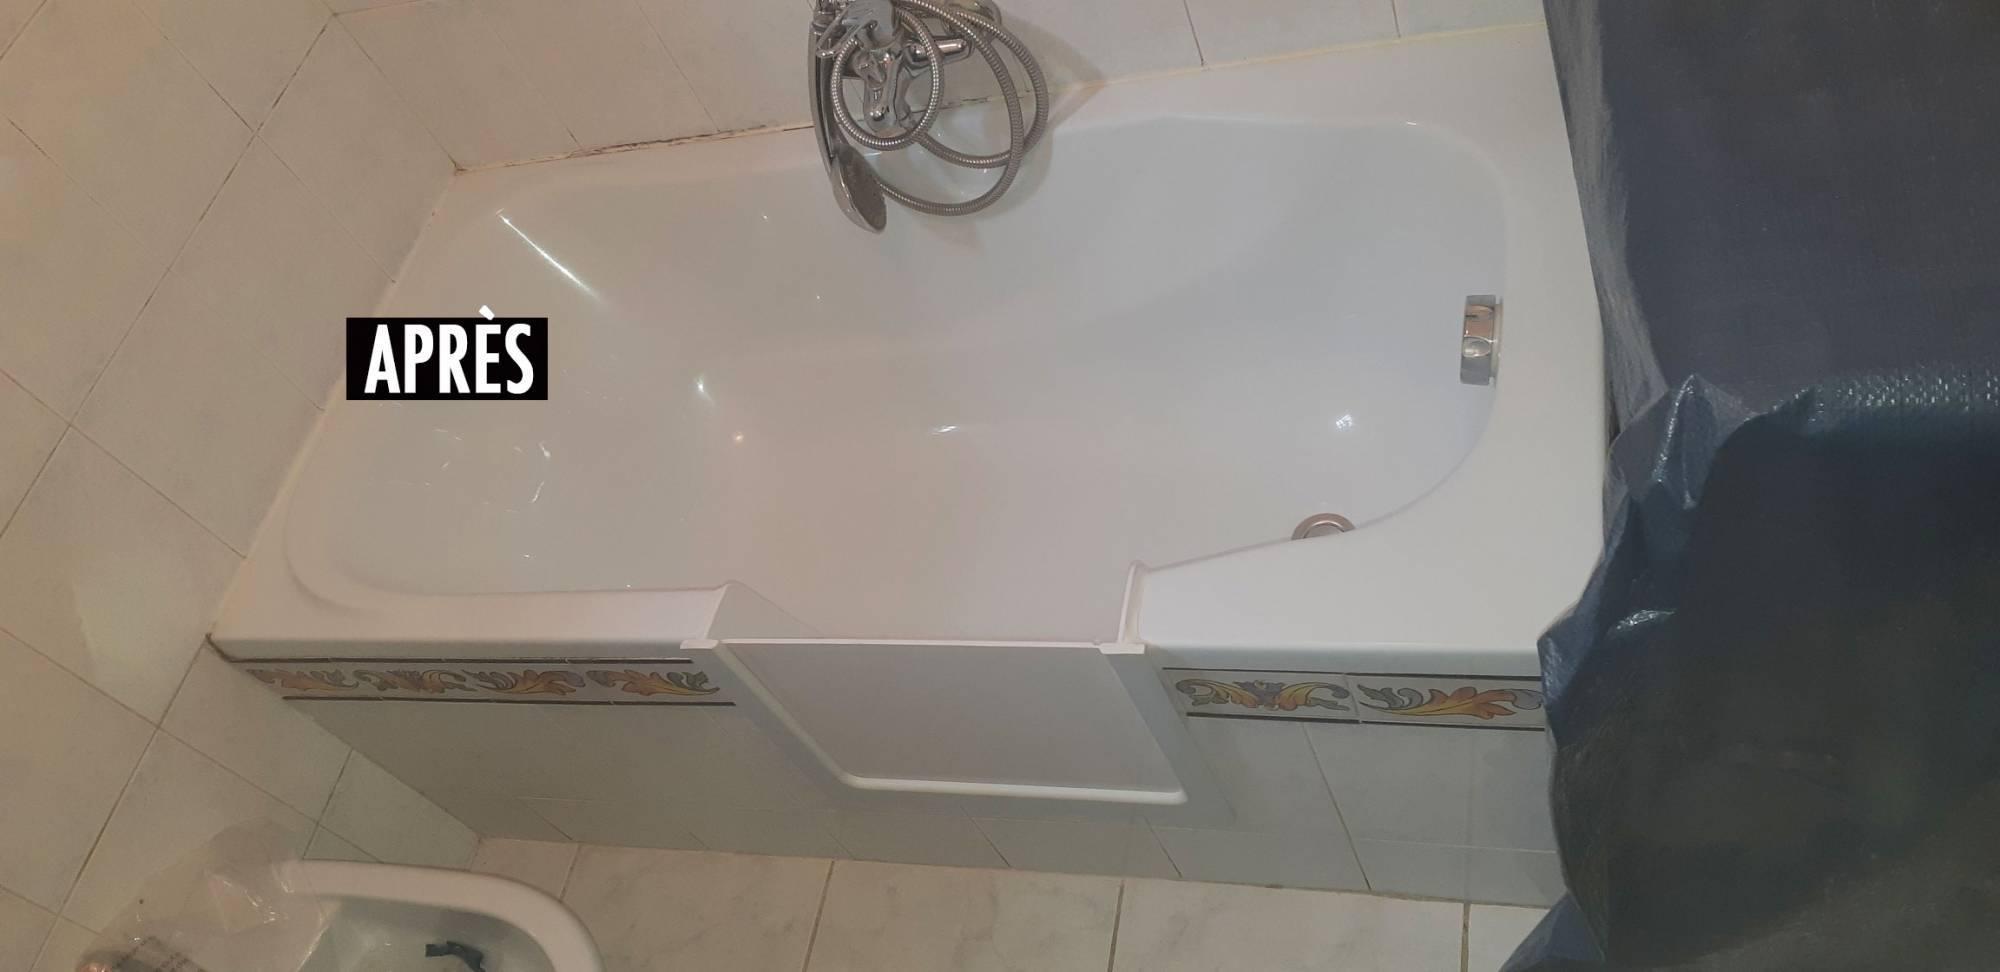 Transformer une baignoire en un bac de douche toulouse 31 - Transformer une baignoire en douche ...